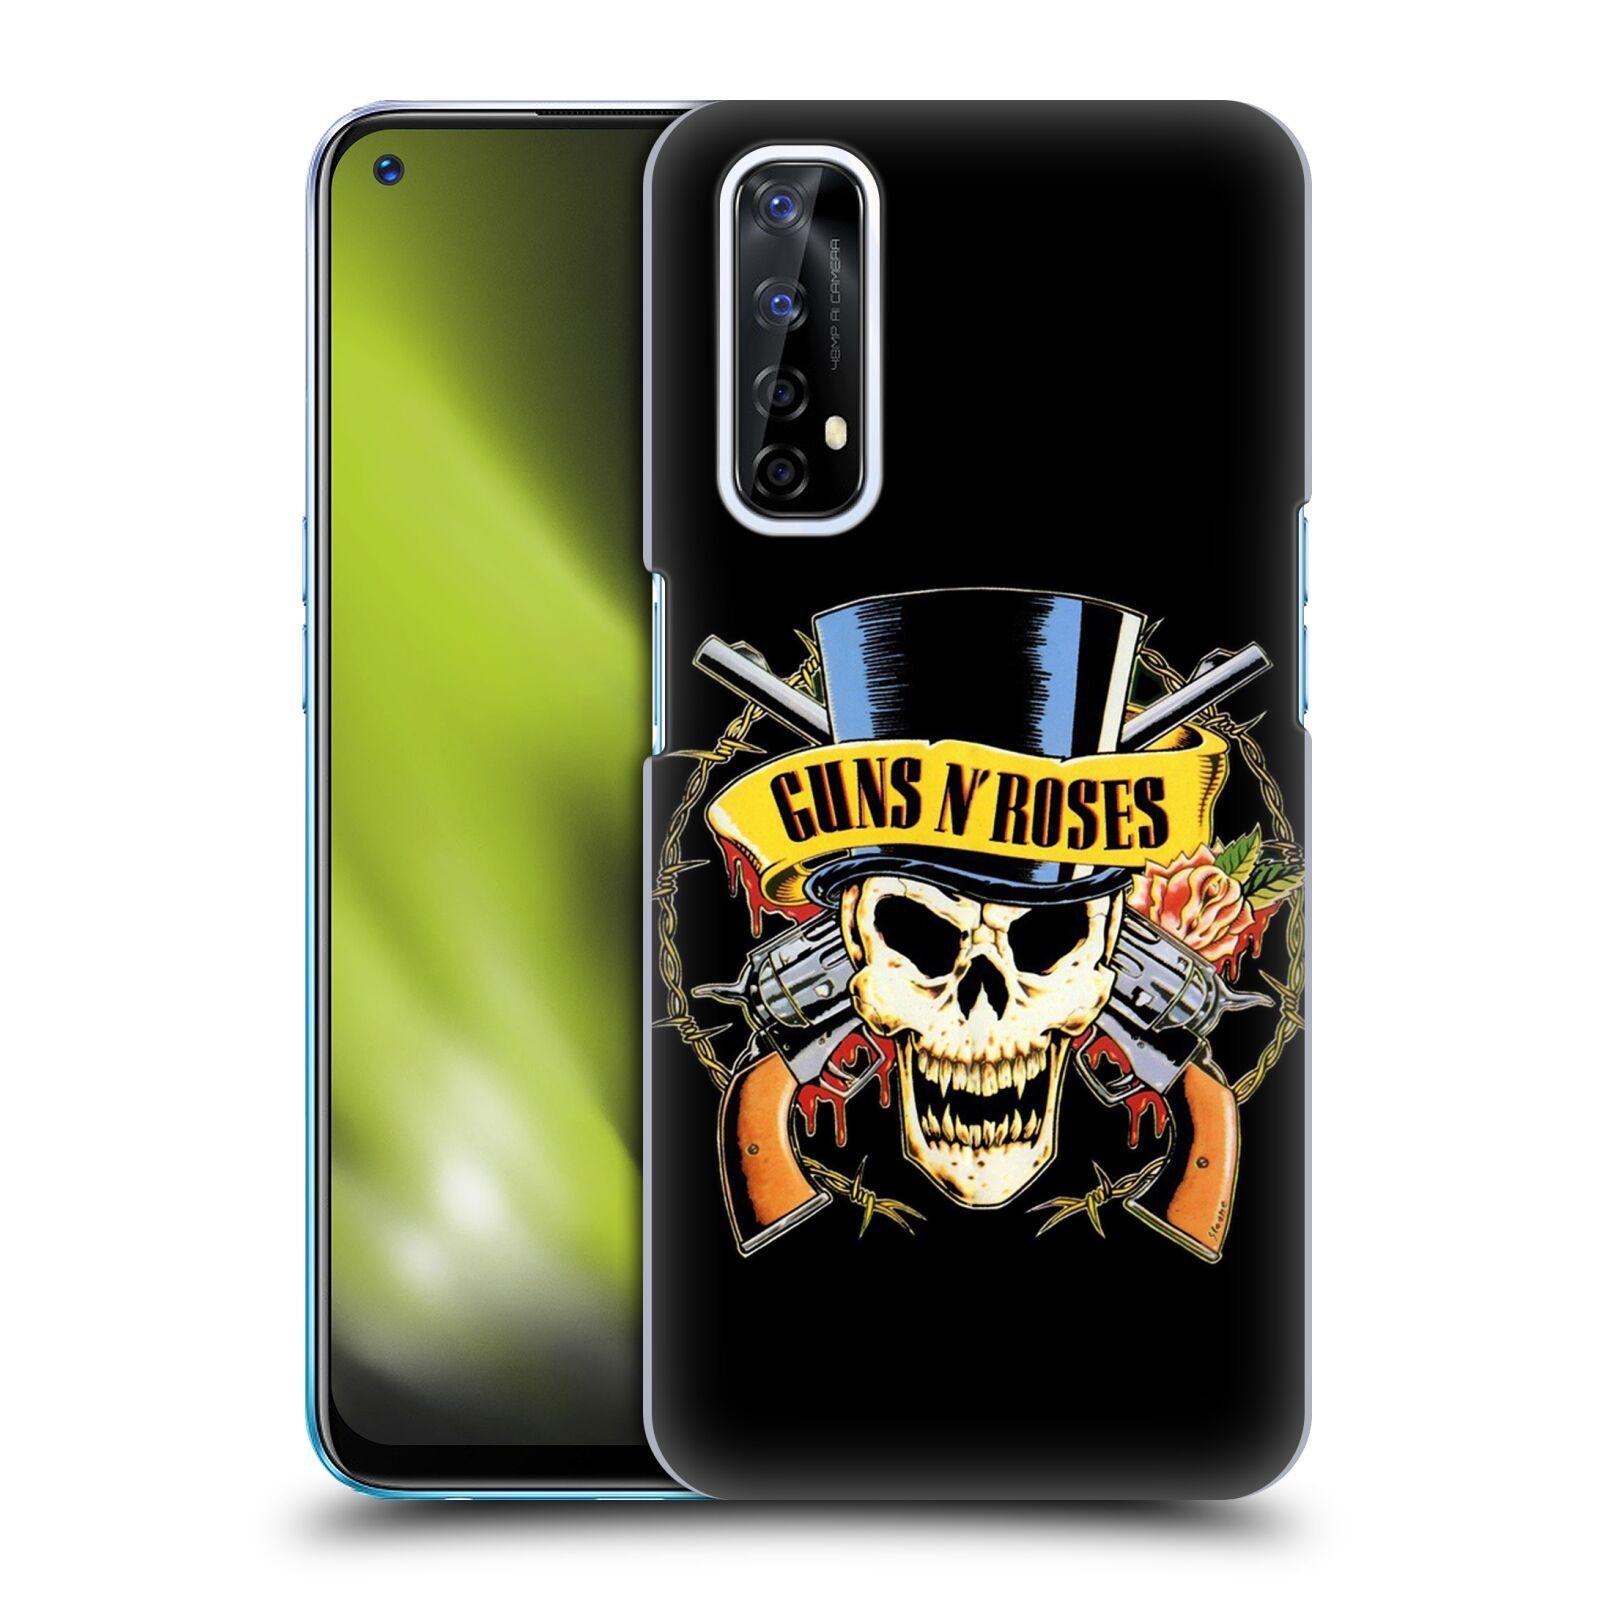 Plastové pouzdro na mobil Realme 7 - Head Case - Guns N' Roses - Lebka